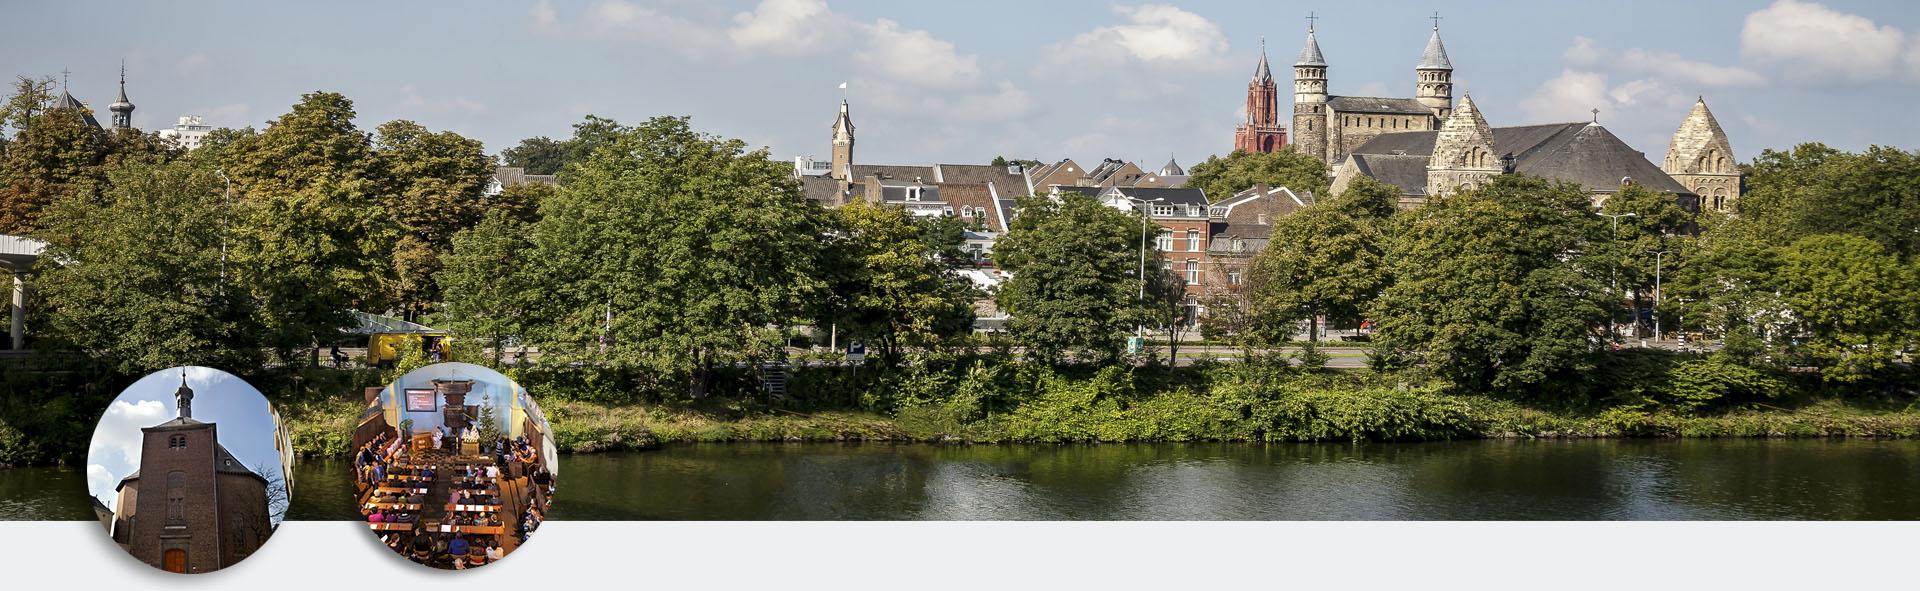 NGKv Maastricht